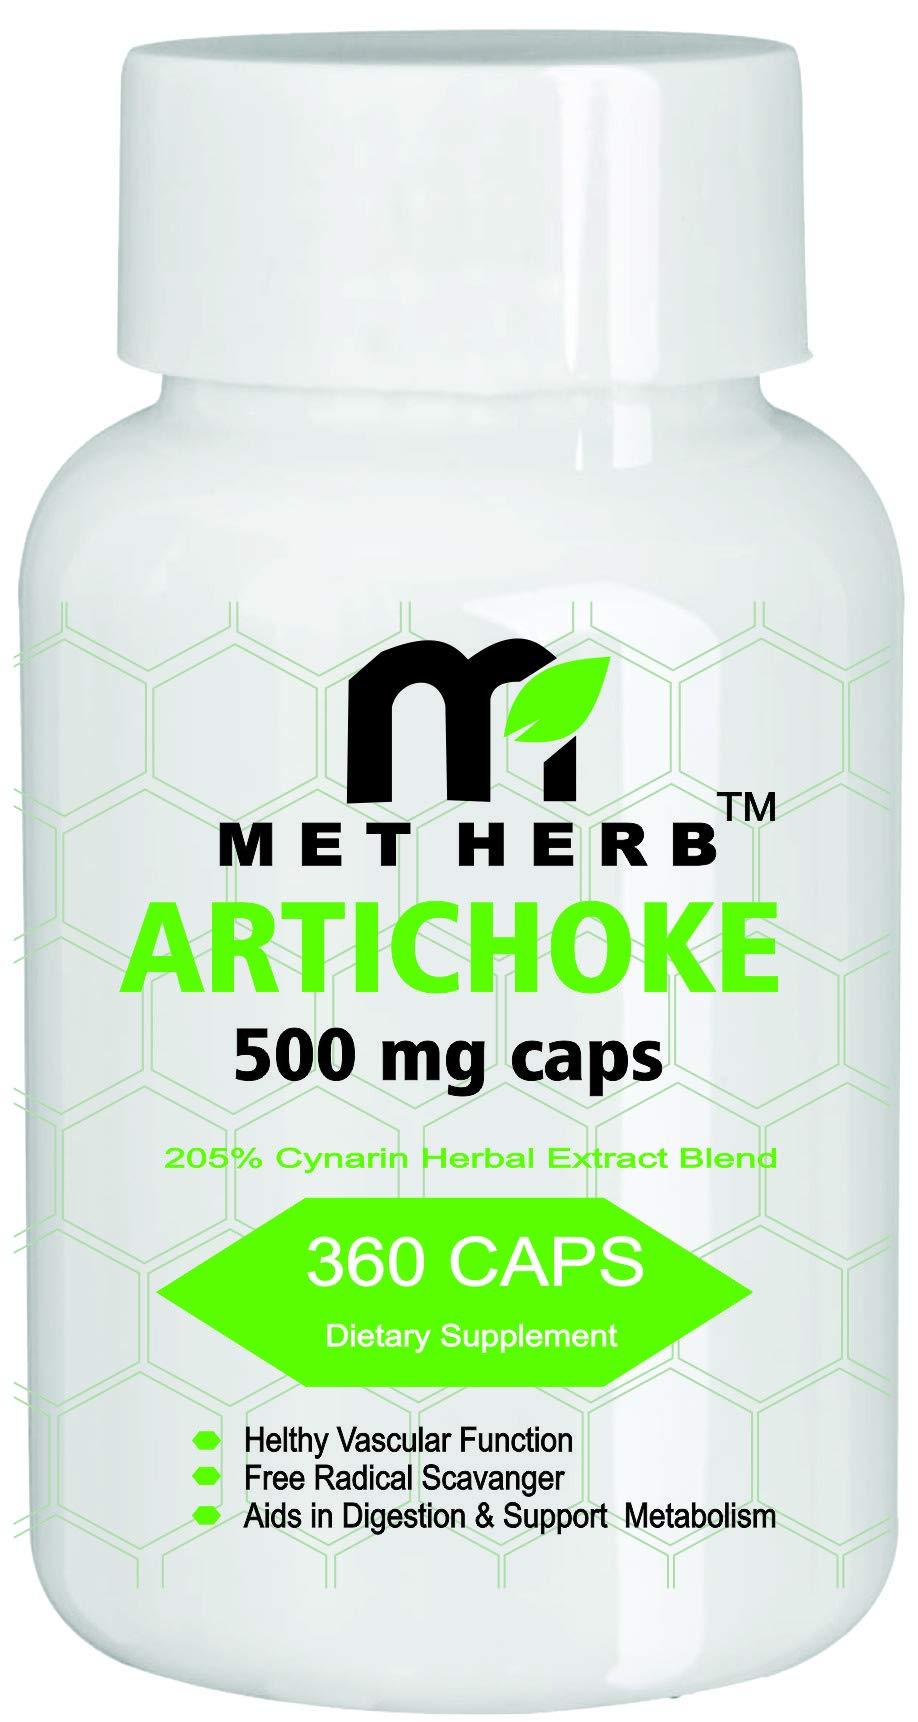 Artichoke Leaf Extract 500mg Veg Capsules Digestive Cardiovascular Support -360 Capsules